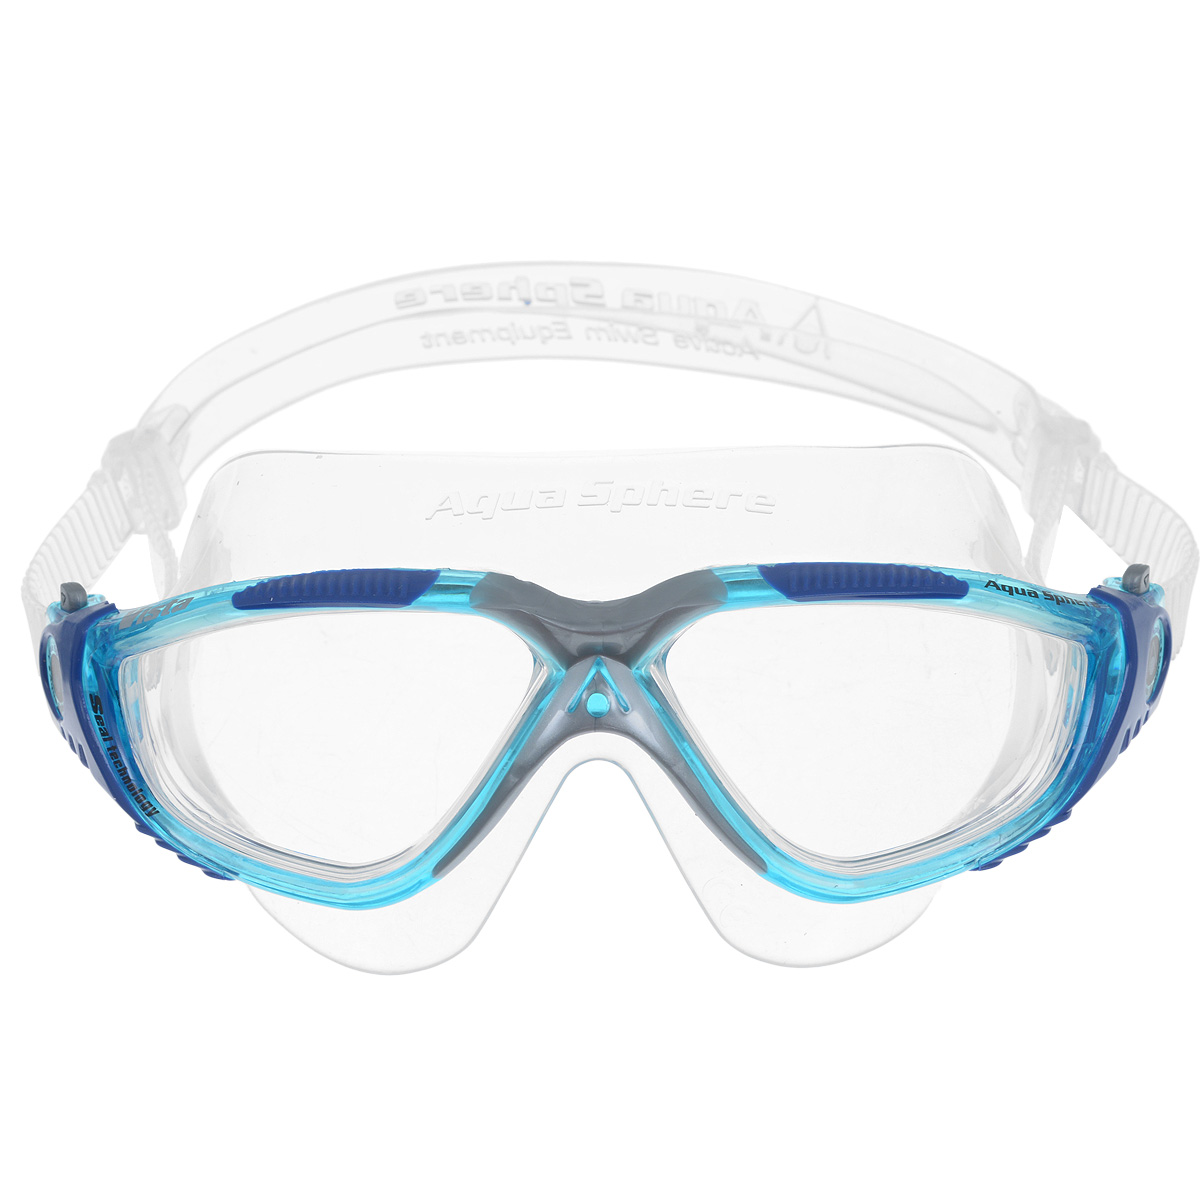 Очки для плавания Aqua Sphere Vista, цвет: аквамарин, синий aqua sphere racing tube green прозрачный силикон